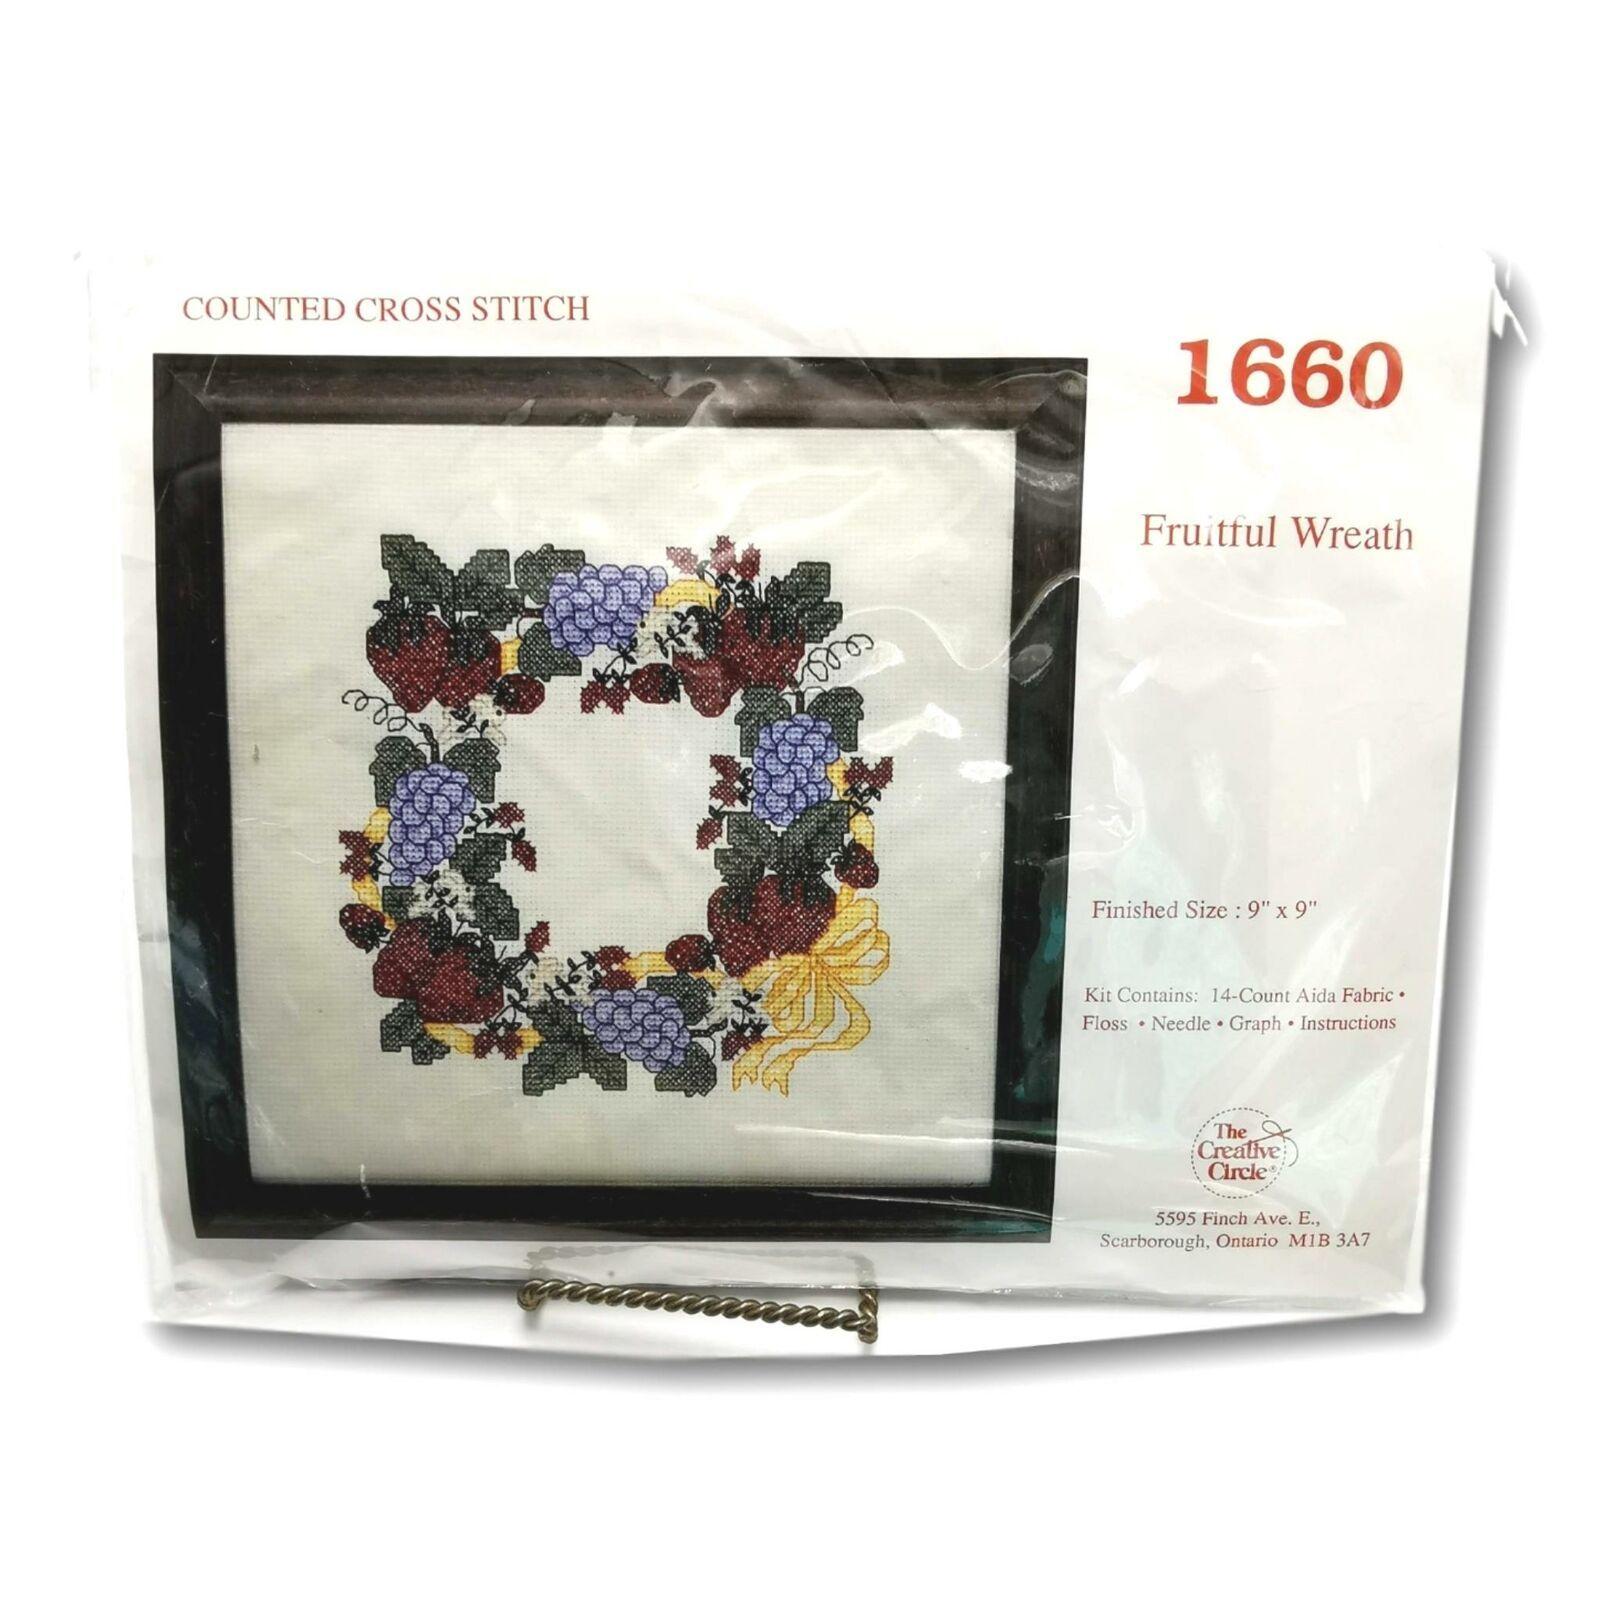 Creative Circle 1660 Fruitful Wreath Counted Cross Stitch Kit Grapes 9 x 9  - $24.99